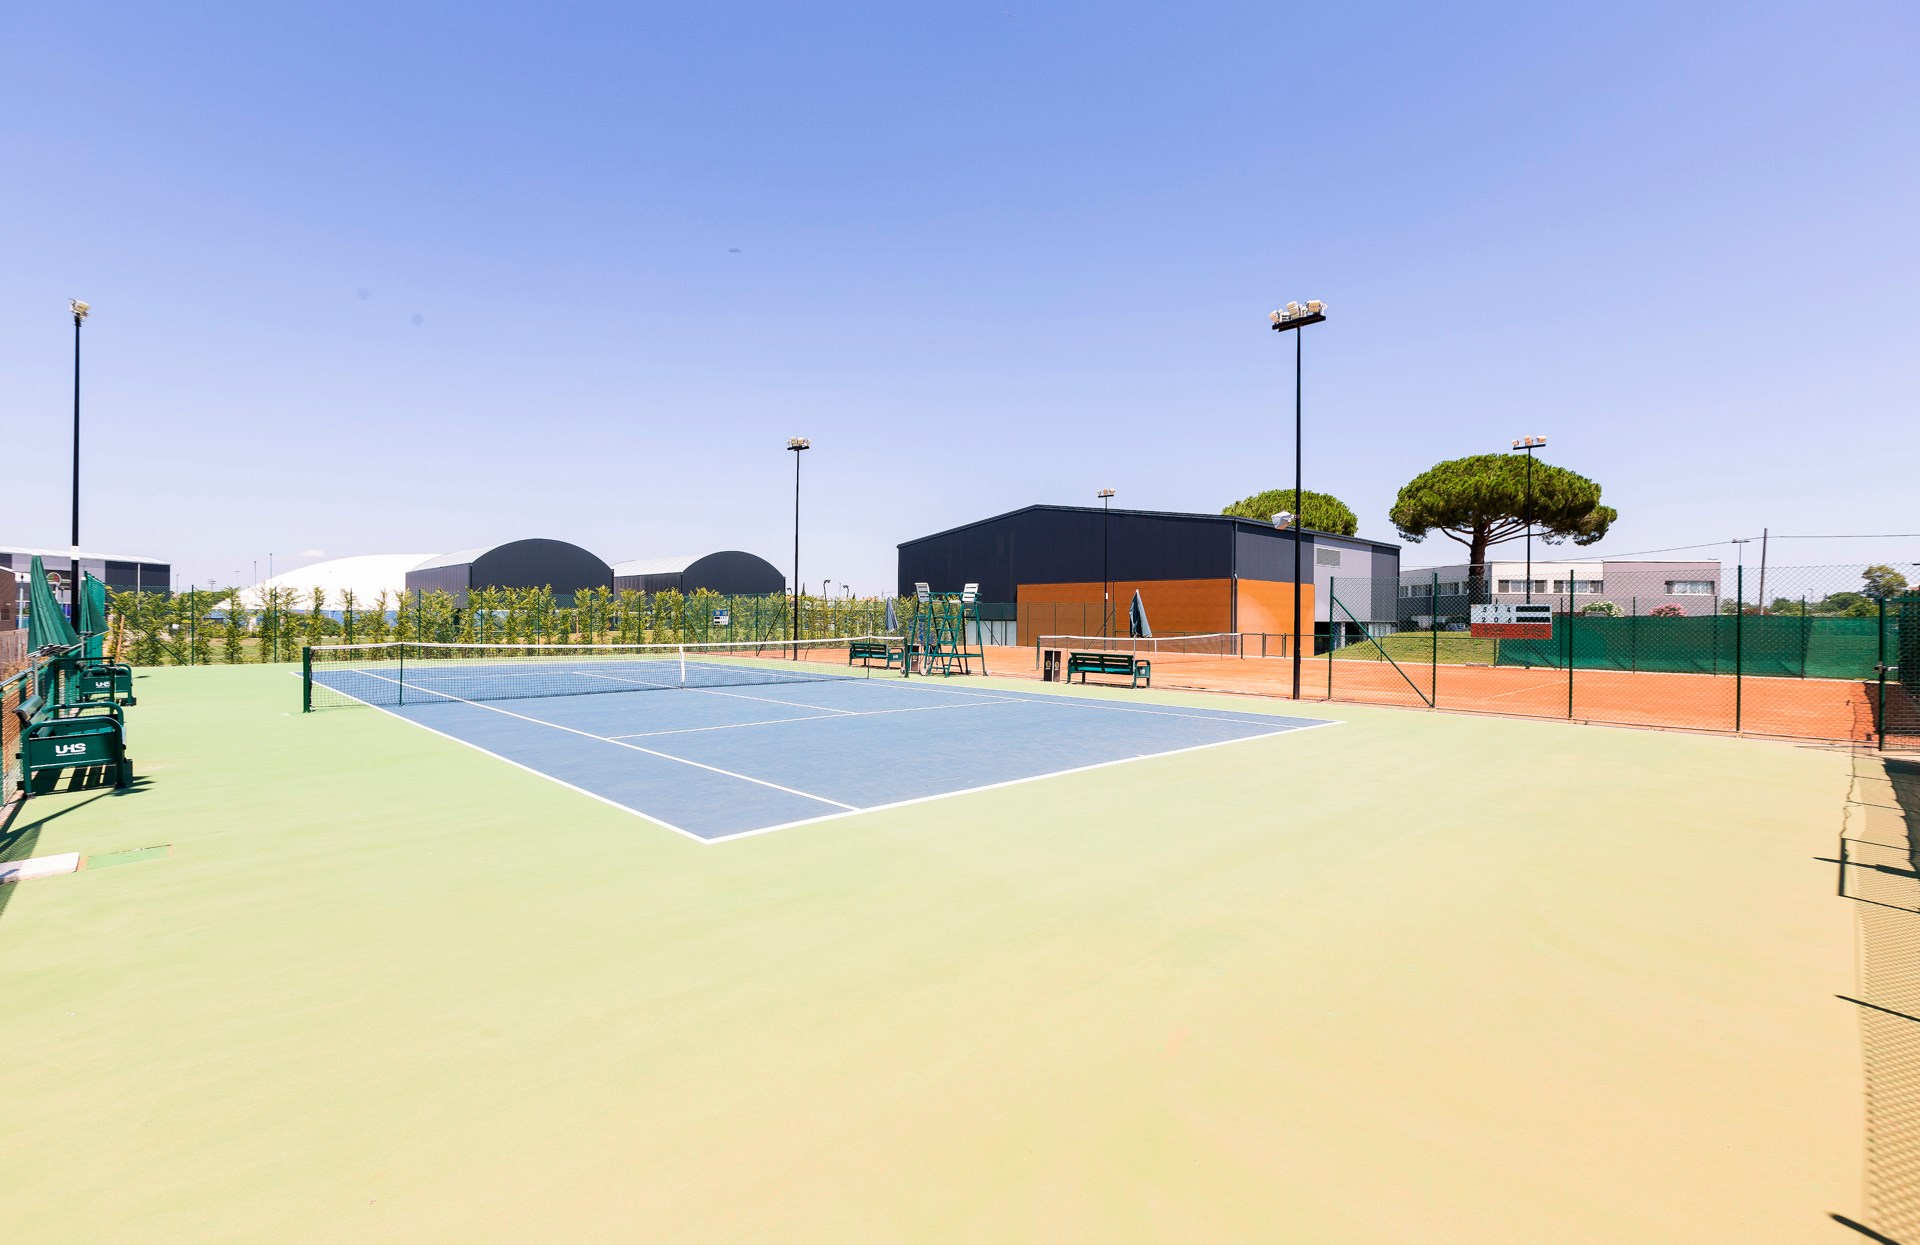 circolo tennis grosseto the village